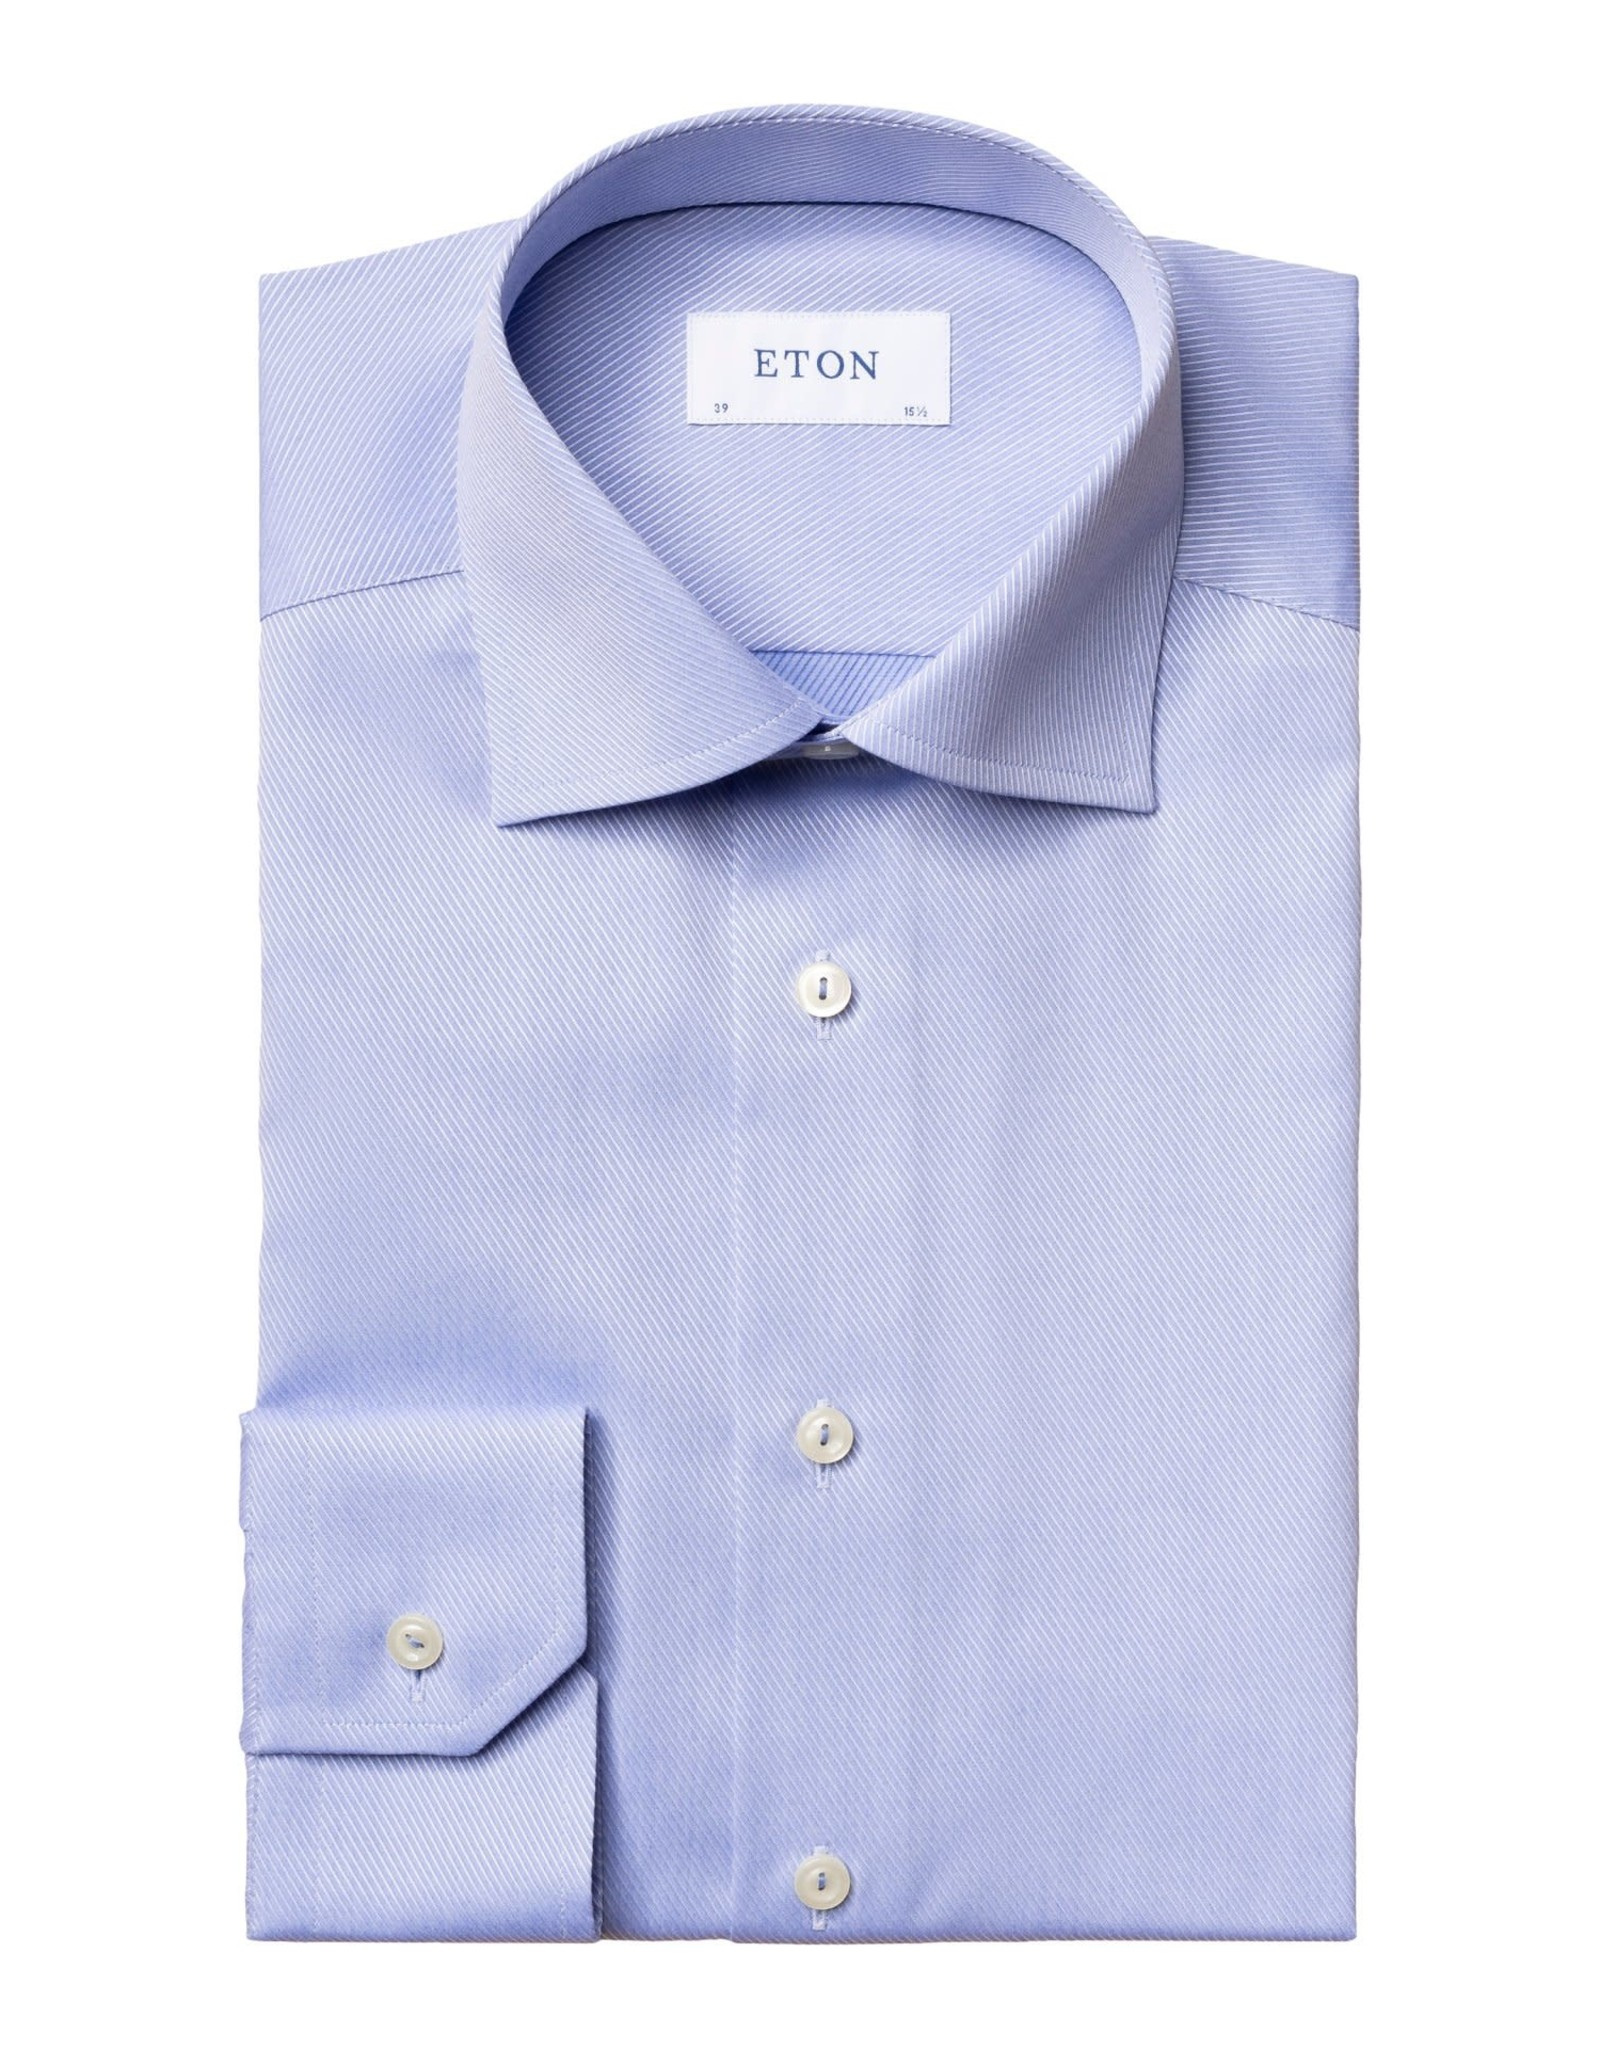 Eton Eton hemd blauw Contemporary 1774/21